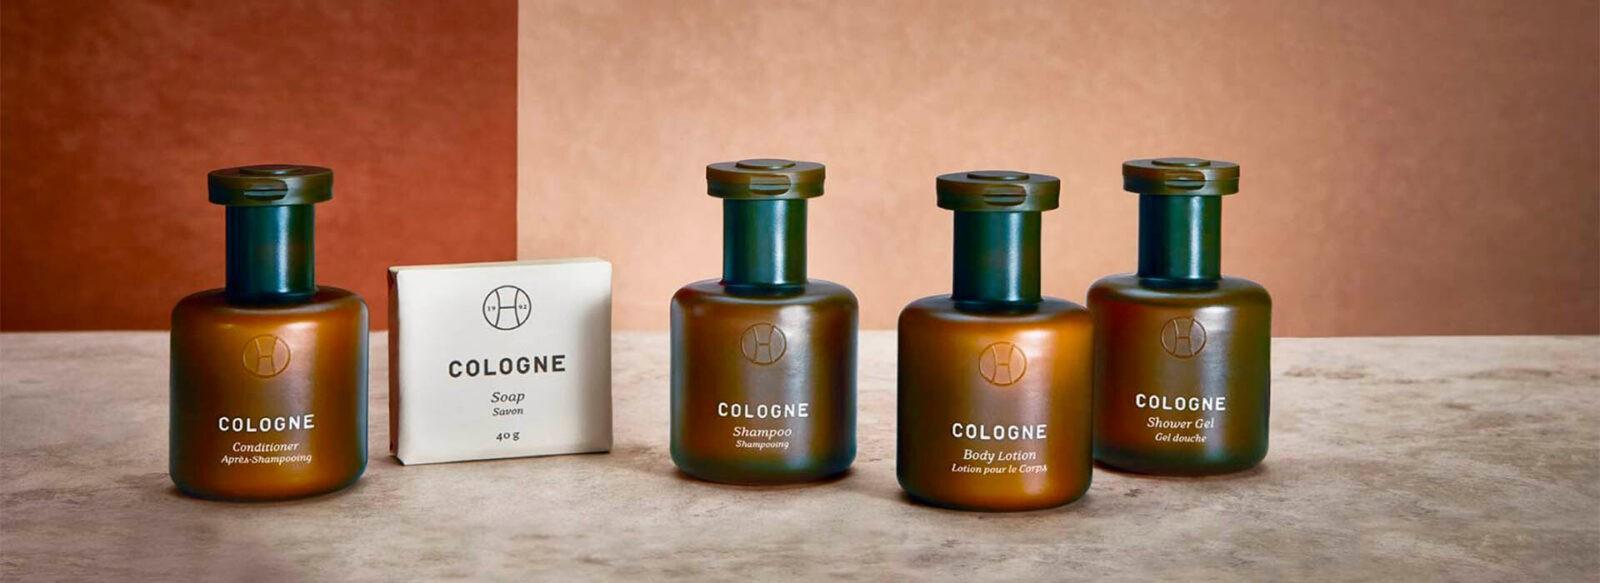 Perfumer H - косметика для гостиниц и отелей